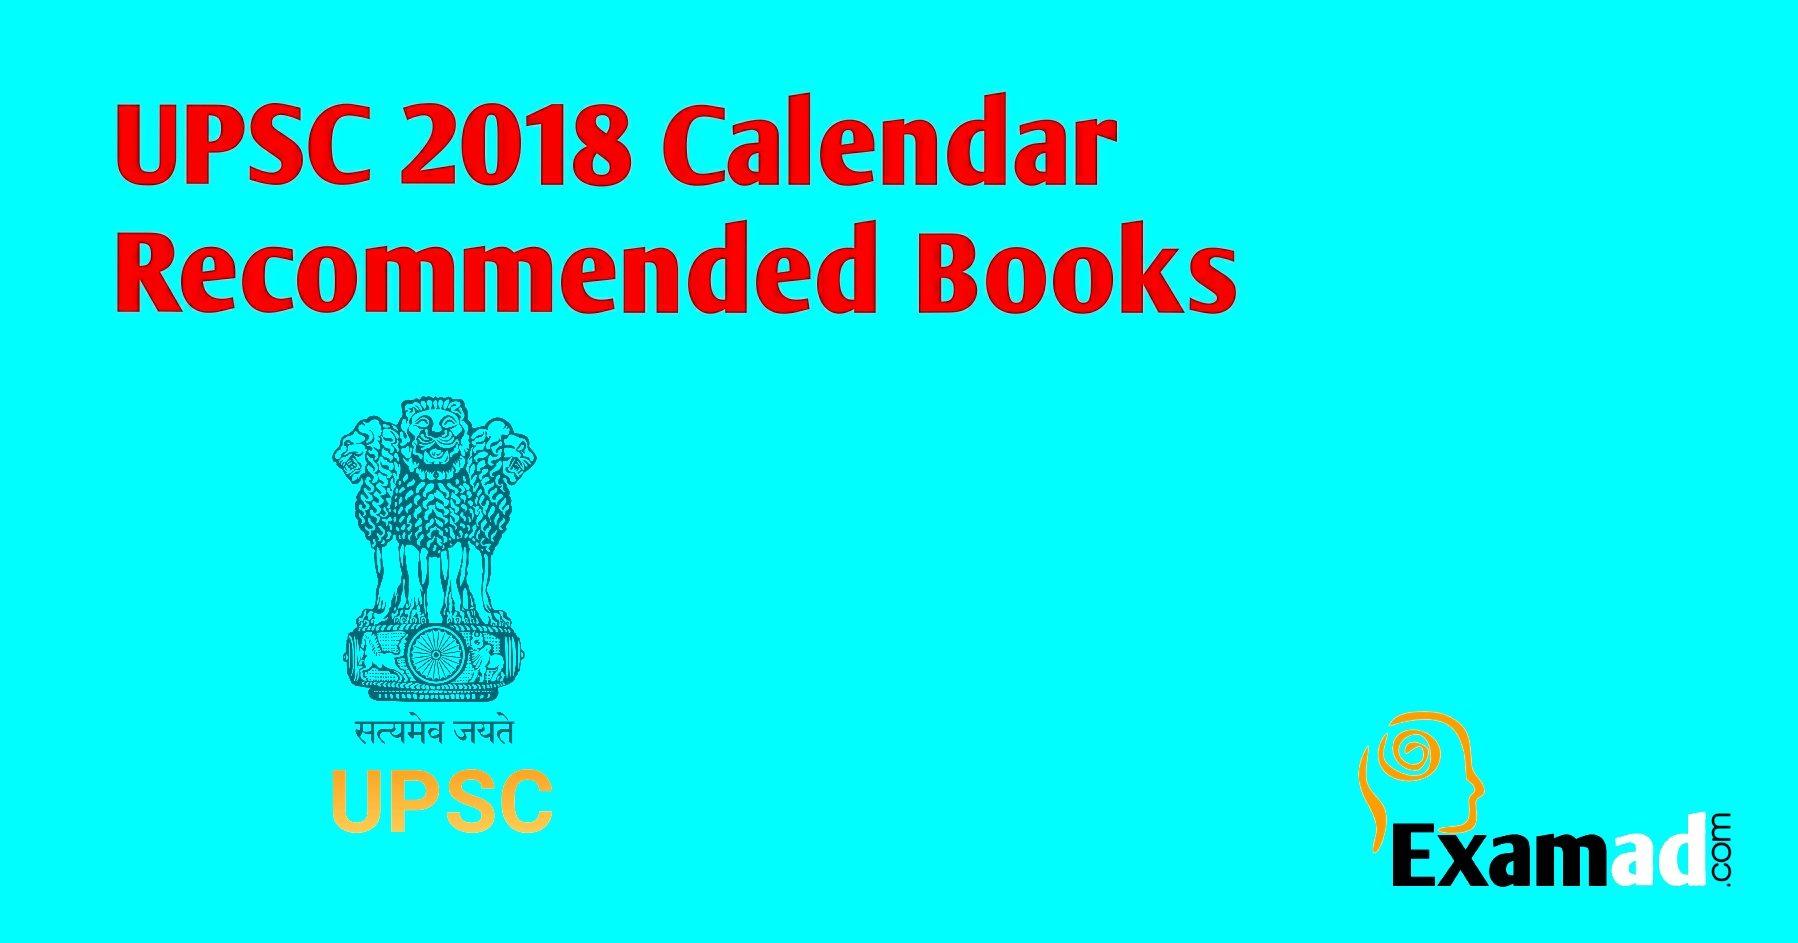 UPSC 2018 calendar